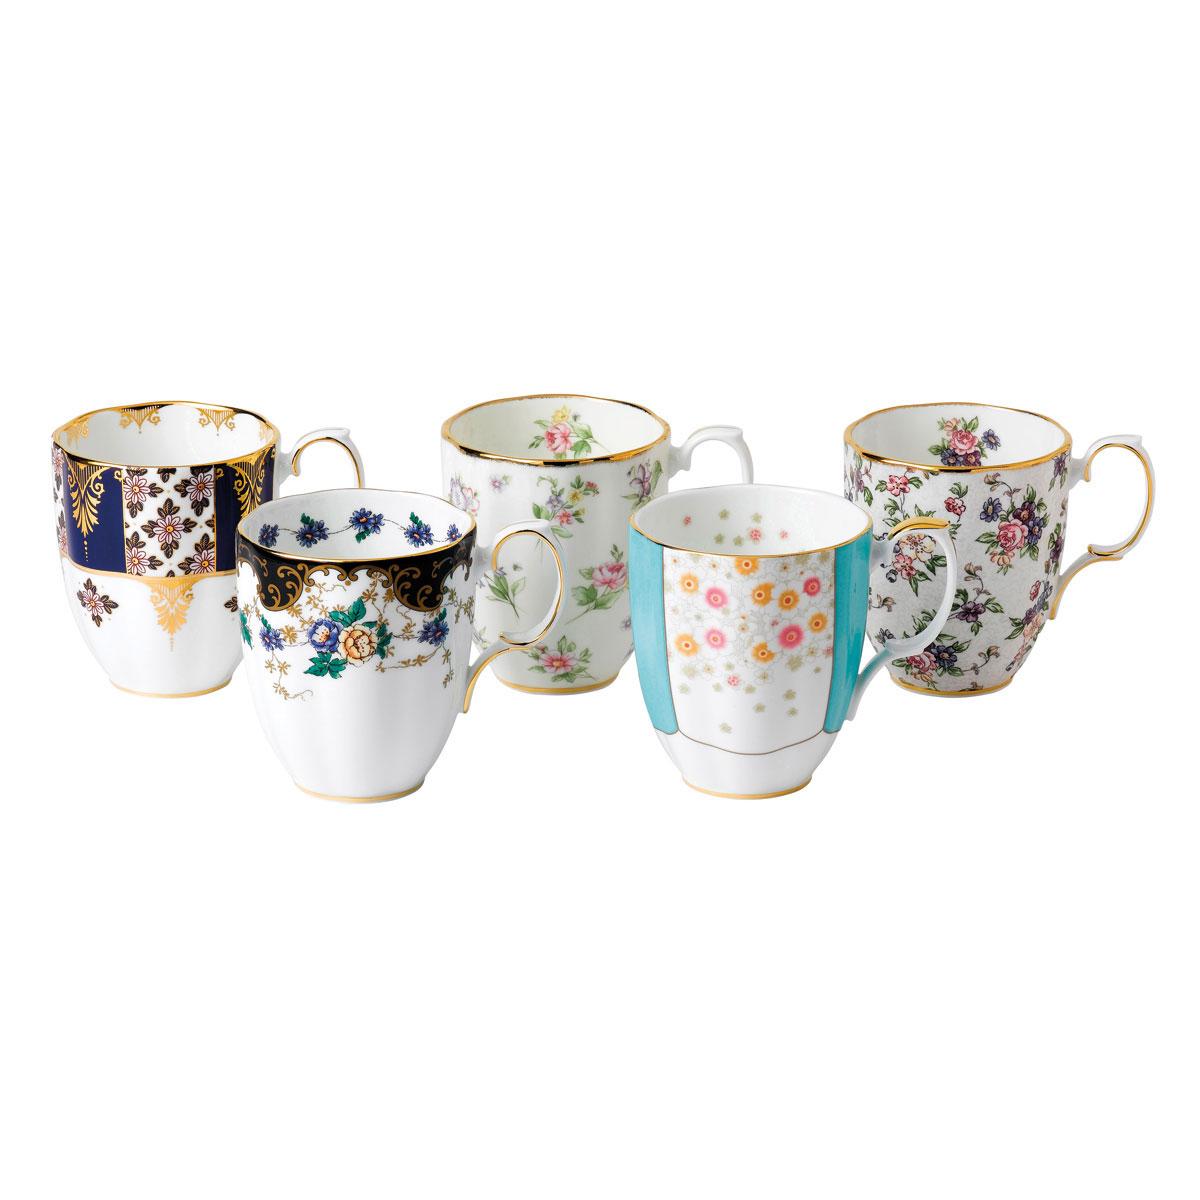 Royal Albert 100 Years 1900-1940 5-Piece Mug Set 14.1 Oz